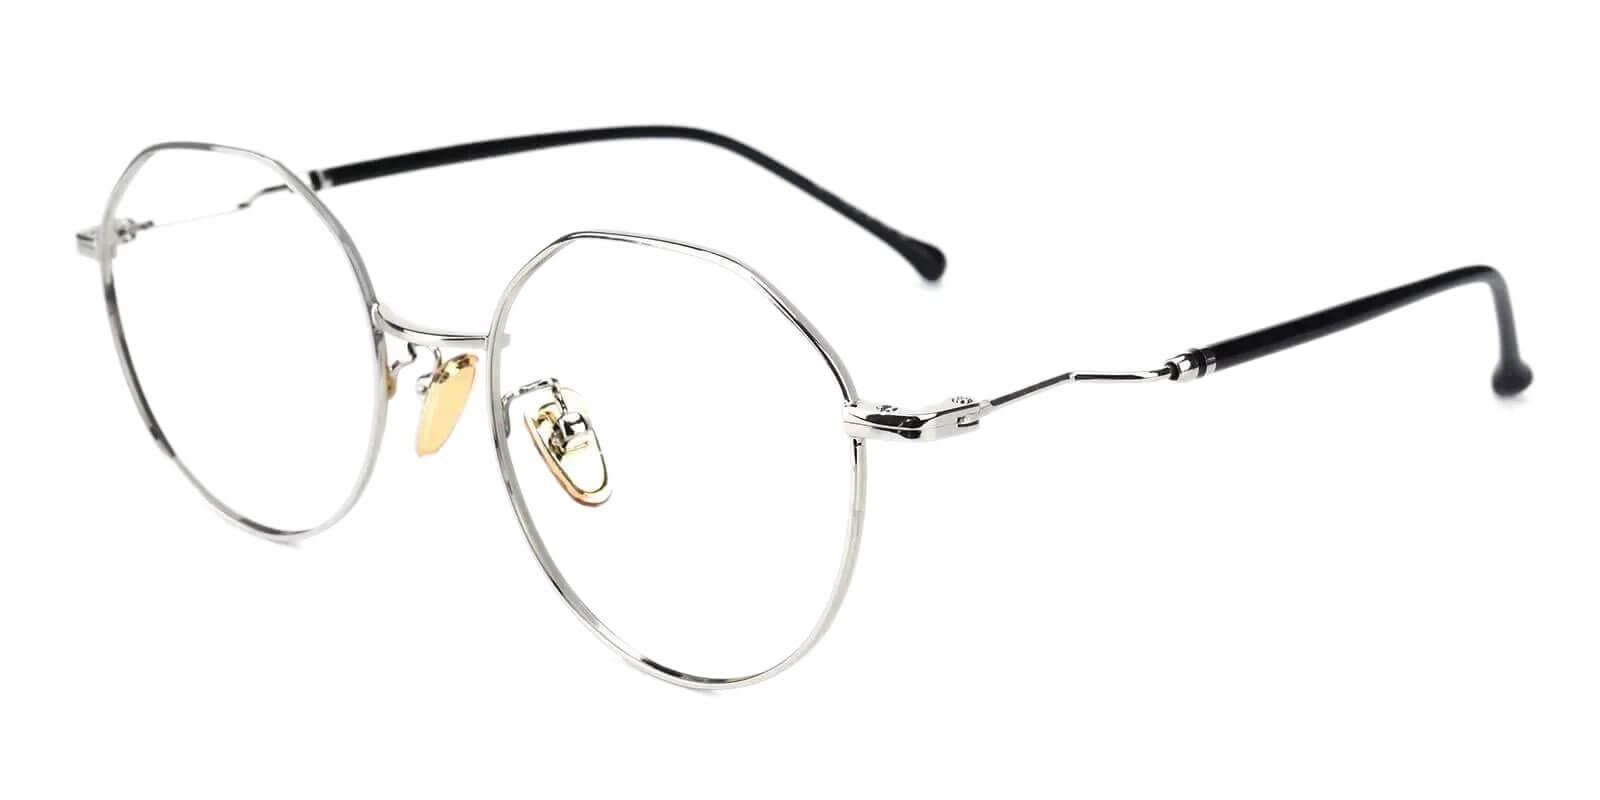 Kawk Silver Metal Eyeglasses , NosePads Frames from ABBE Glasses